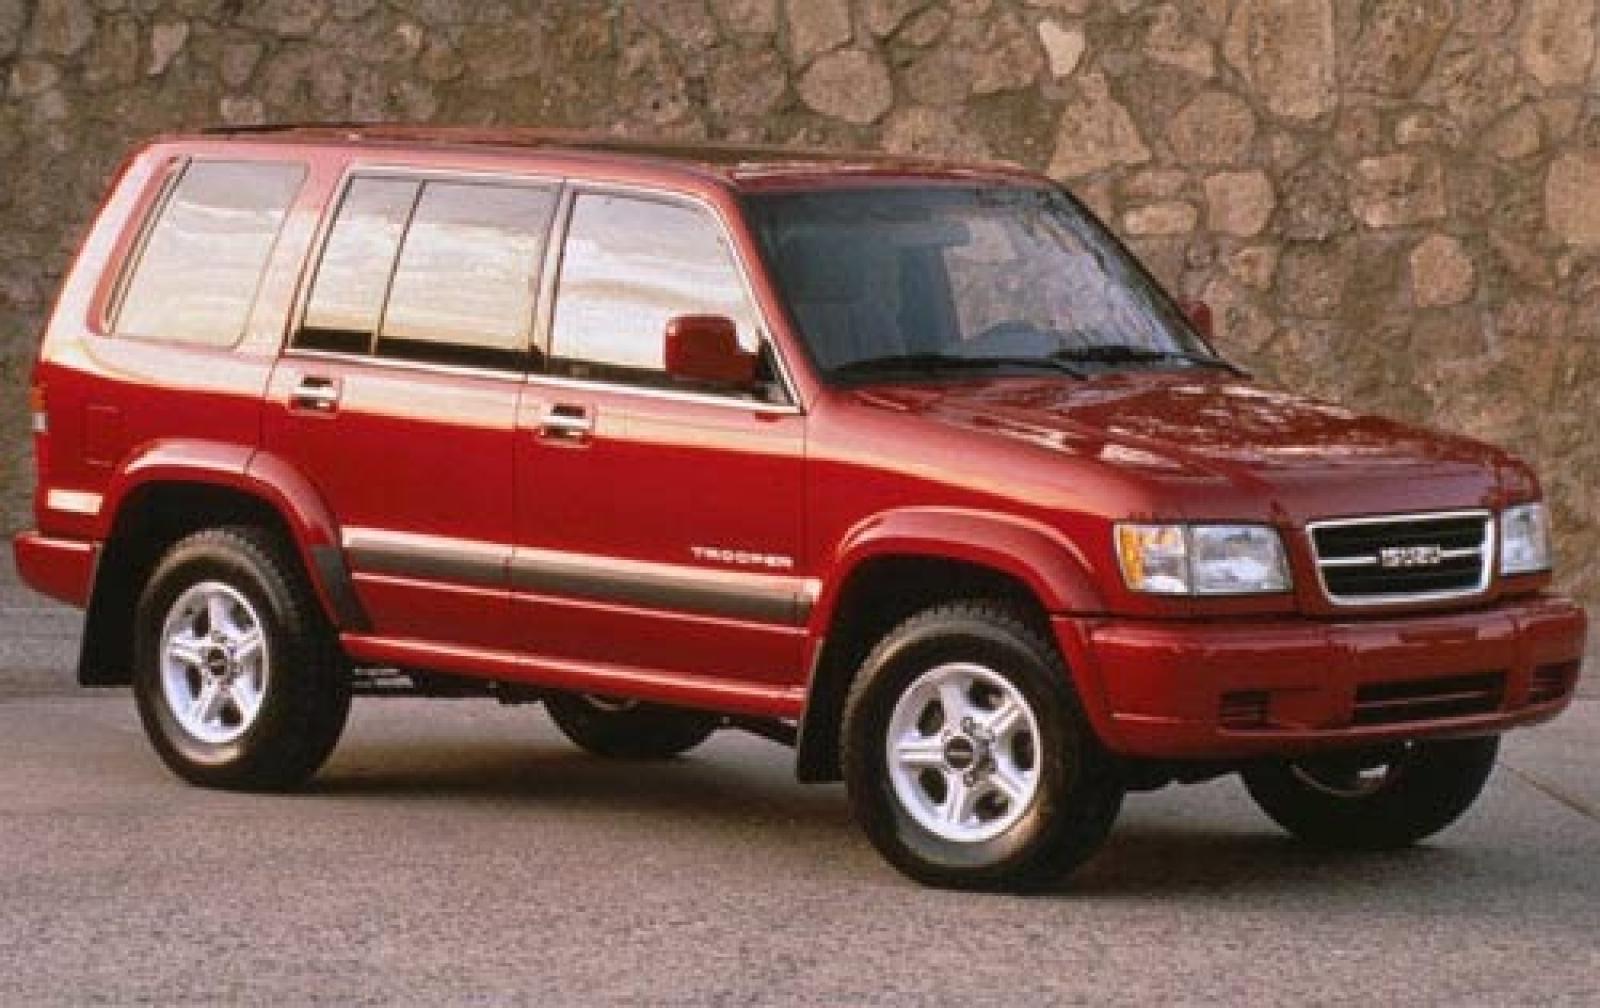 Isuzu Rodeo I 1990 - 1998 SUV 5 door #2